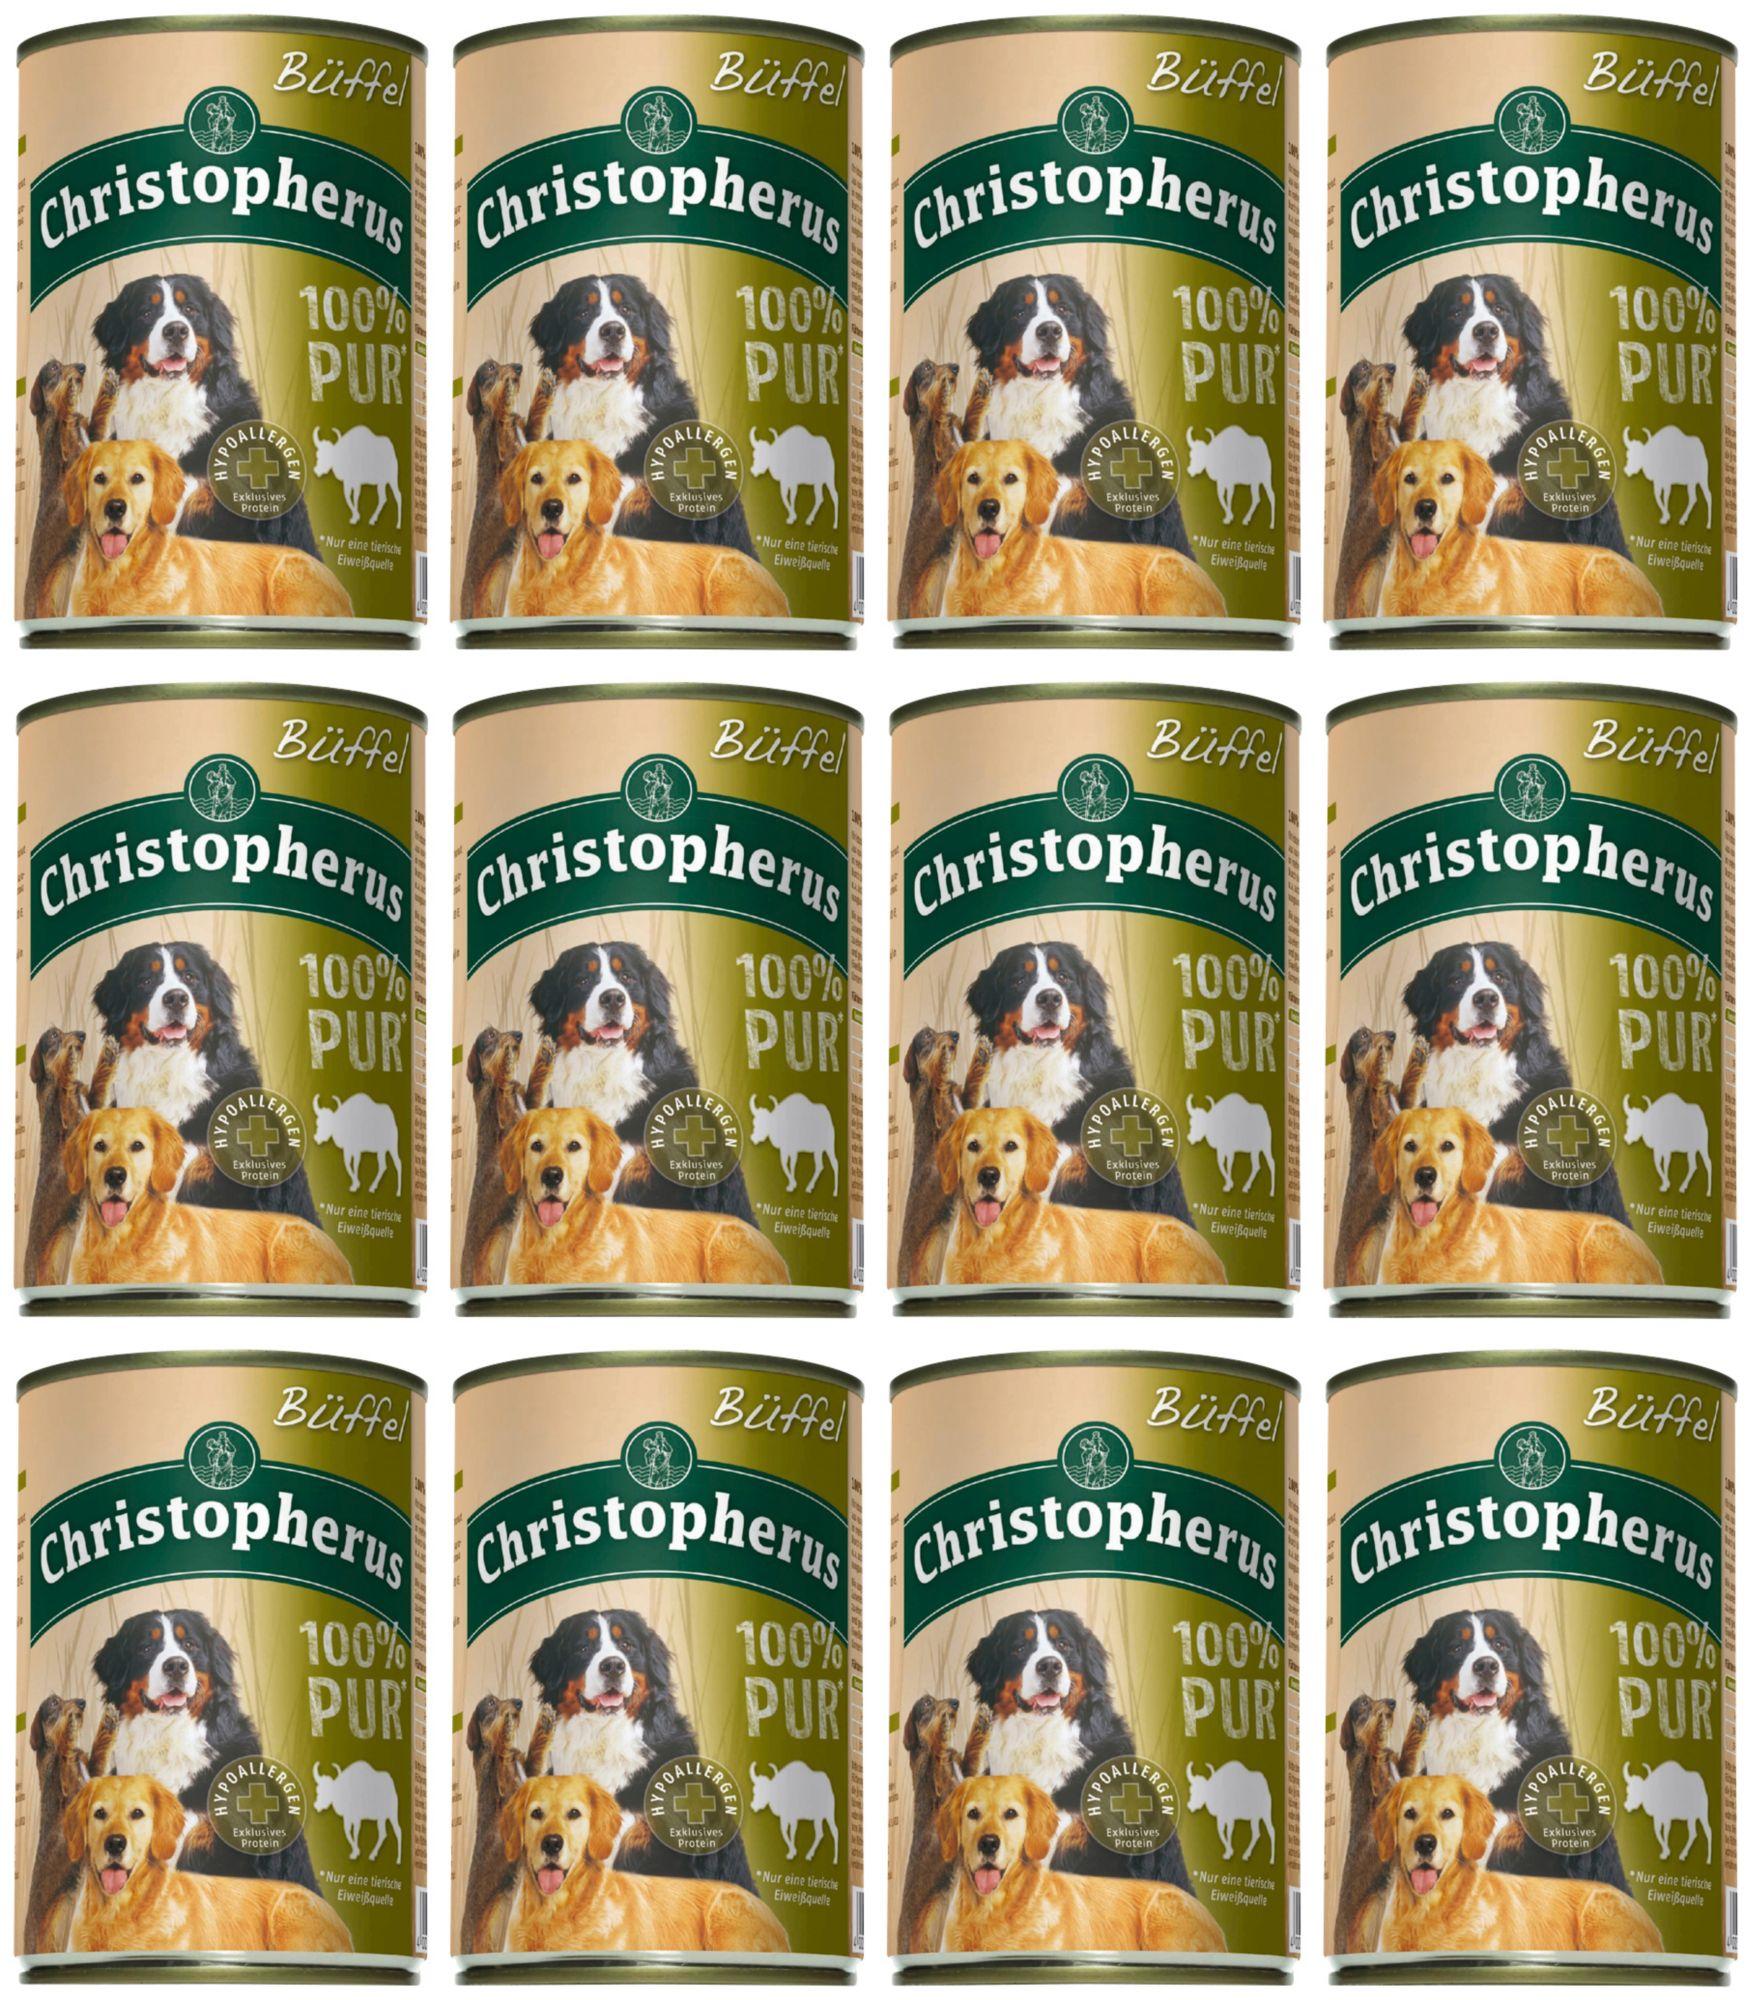 CHRISTOPHERUS Hundenassfutter »100% PUR Büffel«, 12 Dosen á 400 g